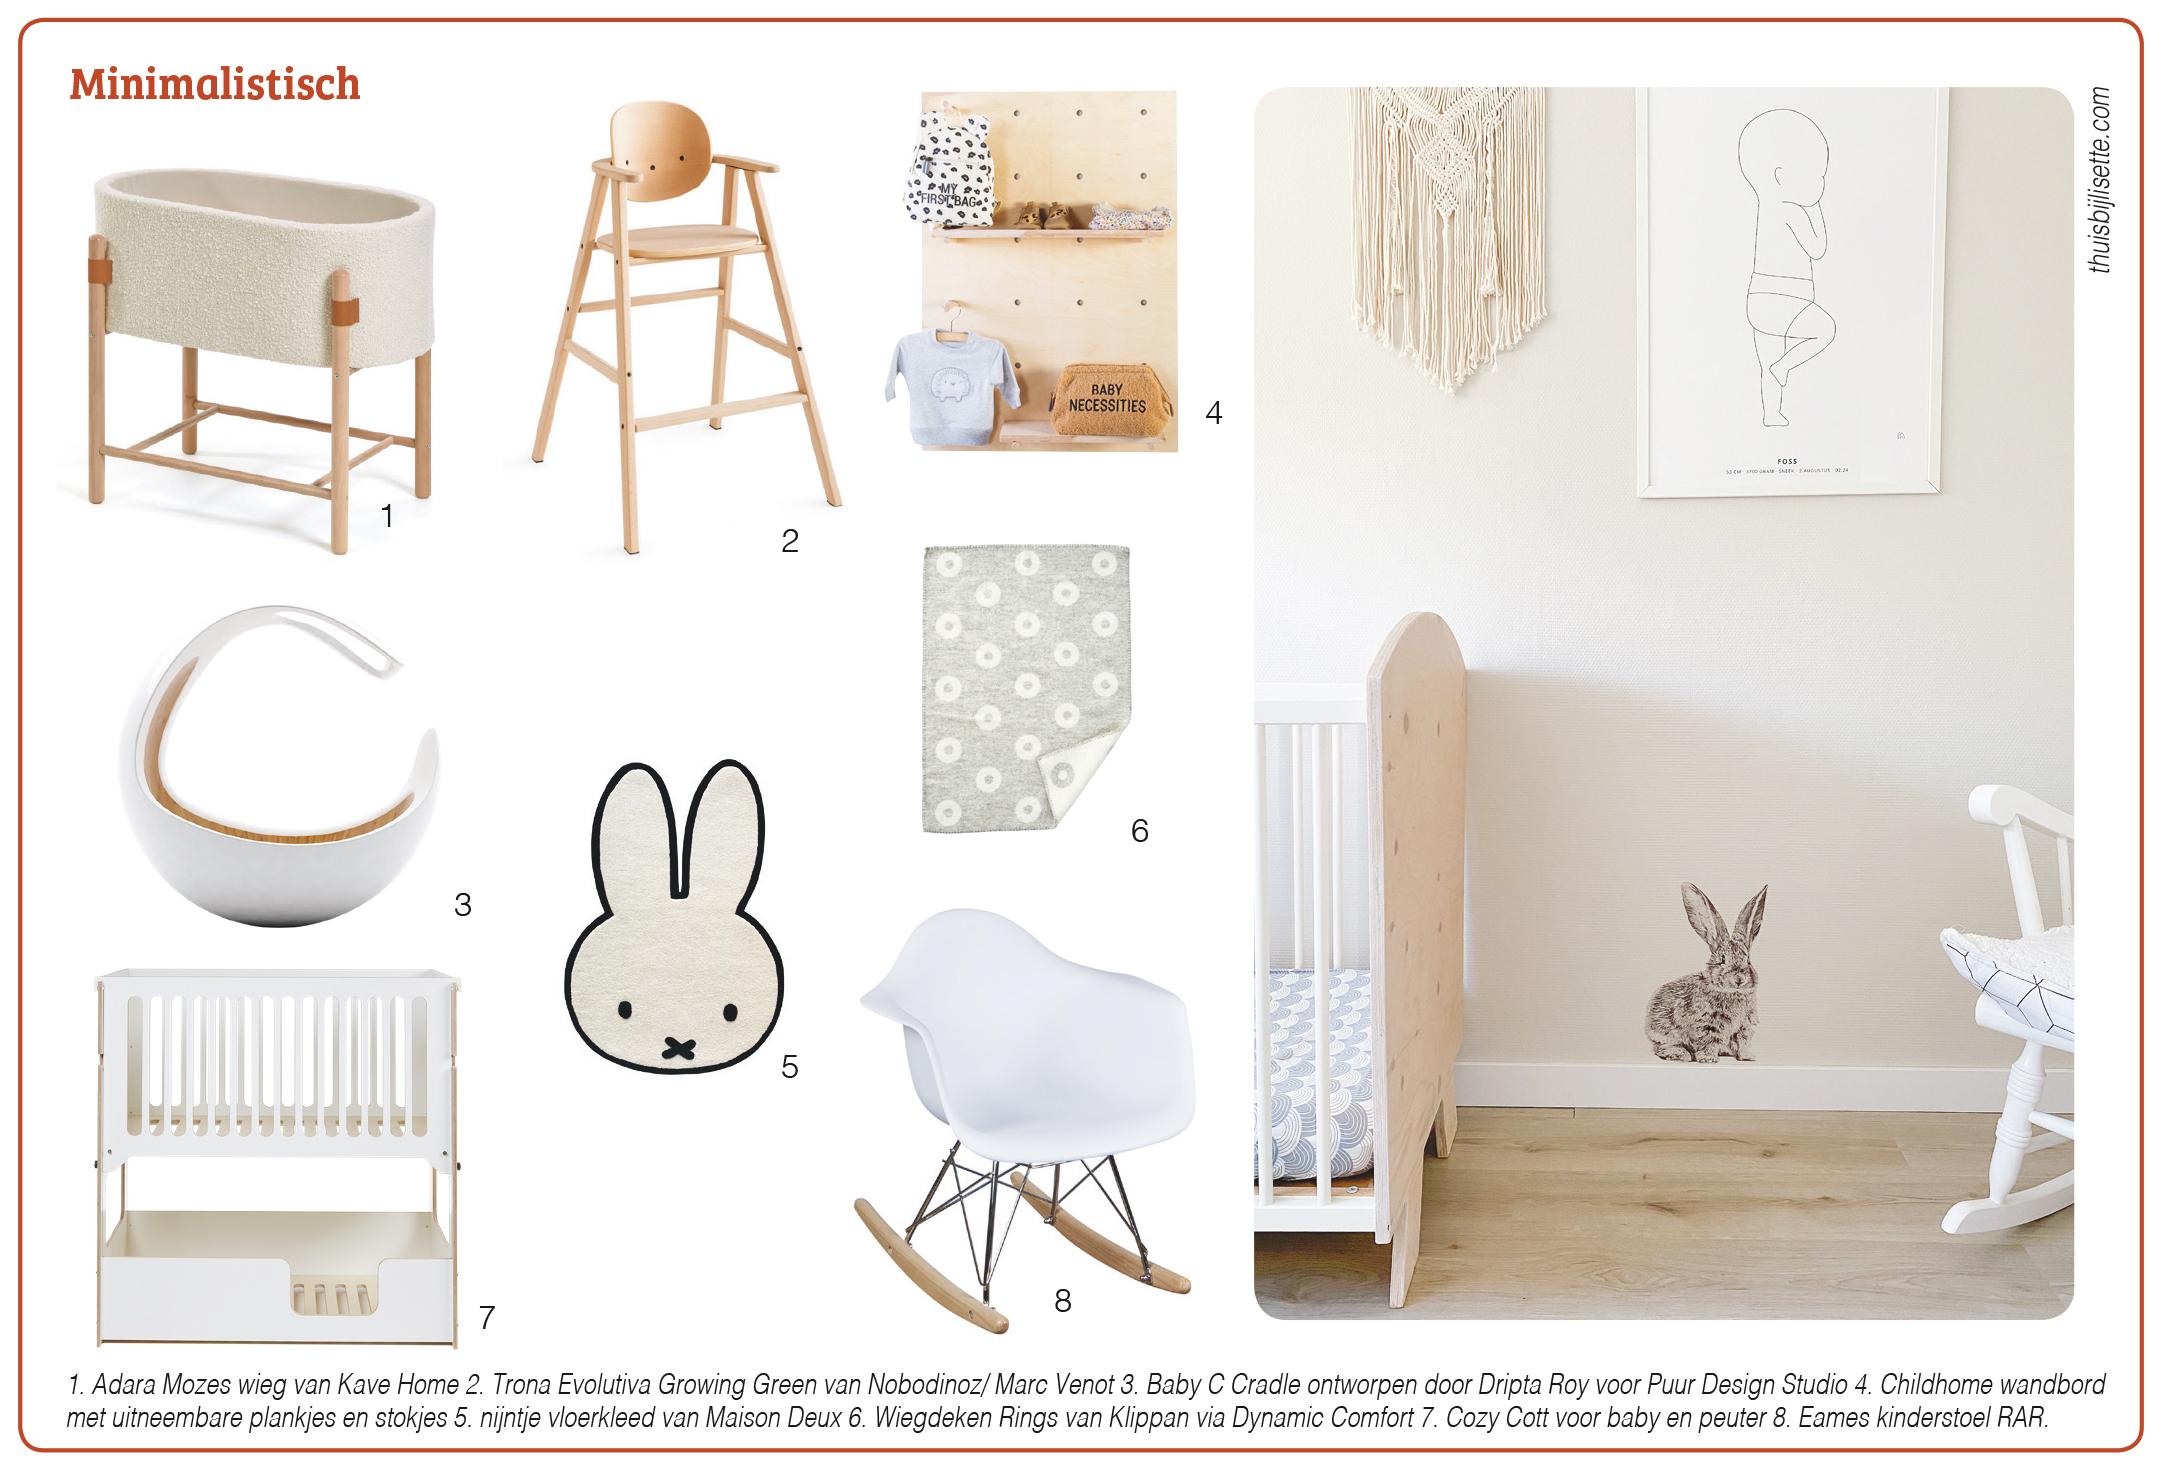 babyroom trends 2021 minimalism